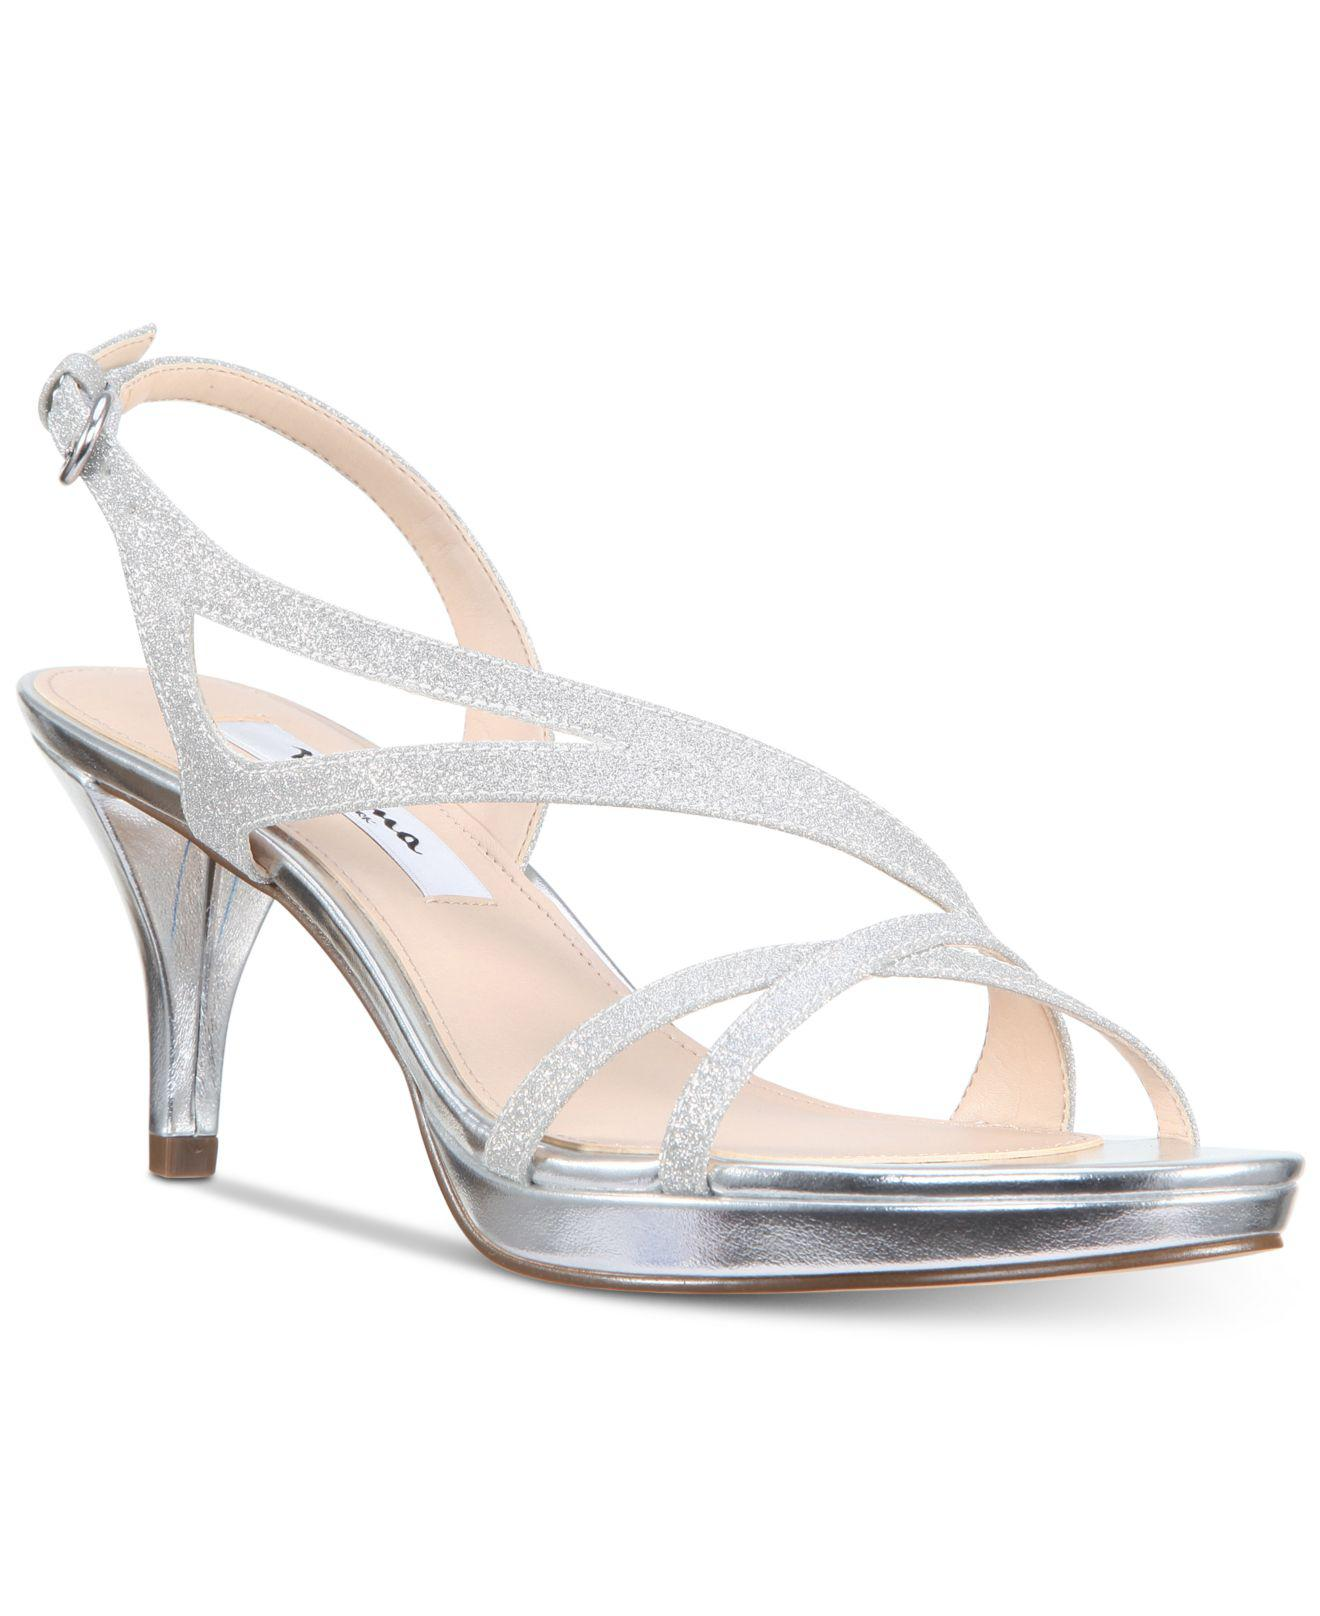 d2589b08728 Nina Nura Evening Sandals in Metallic - Lyst